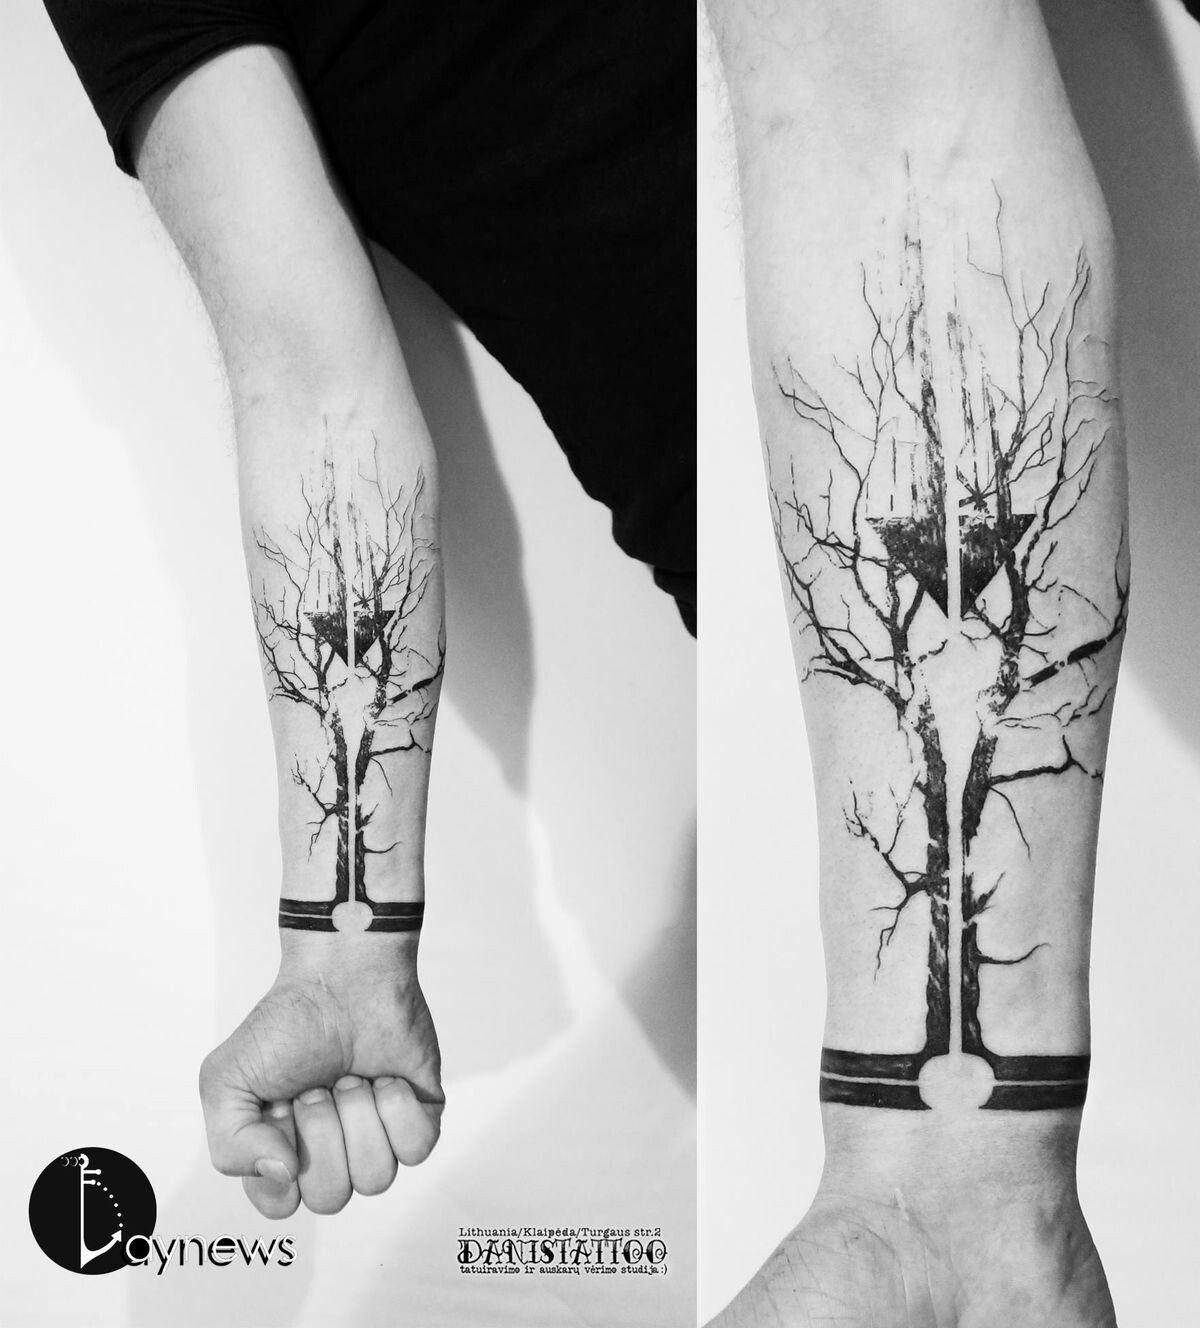 Samoantattoos Samoan Tattoos Forearm Arm Tattoo Electronic Circuit Board Full Sleeve Blackwork Male Forest Nature New Cool Arrow